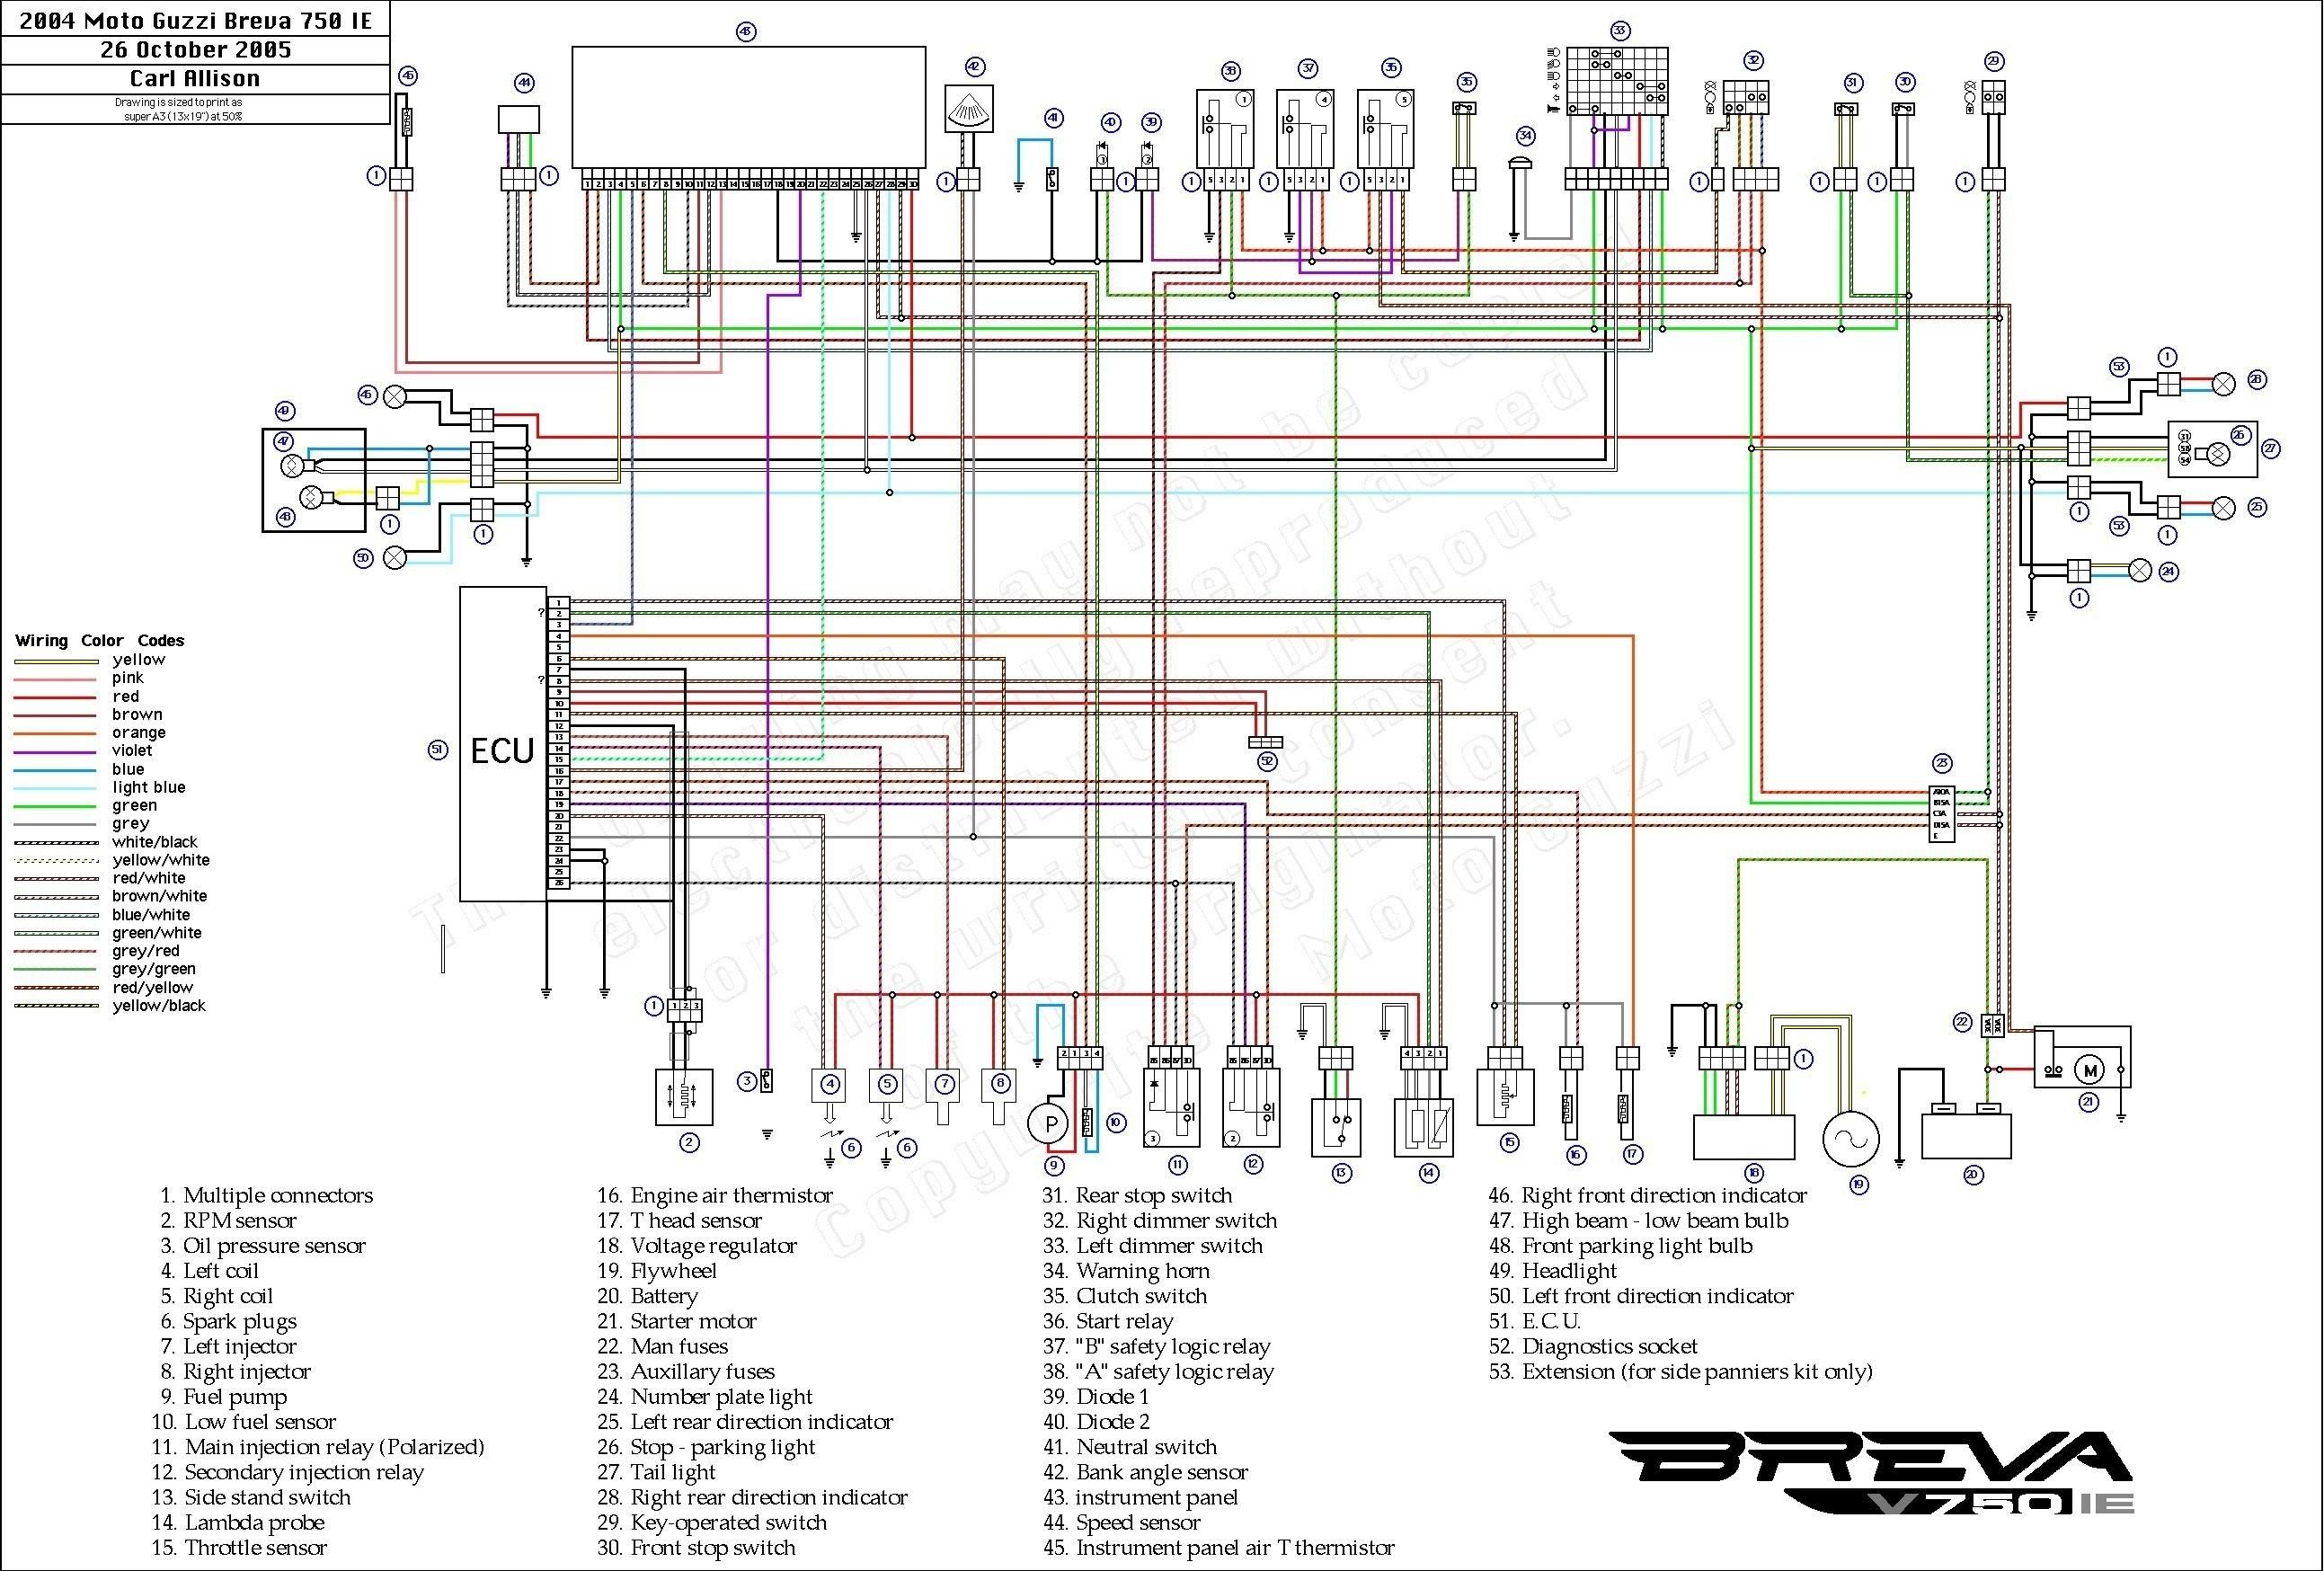 2000 Dodge Caravan Wiring Diagram 2001 Dodge Durango Parts Diagram Start Building A Wiring Diagram • Of 2000 Dodge Caravan Wiring Diagram